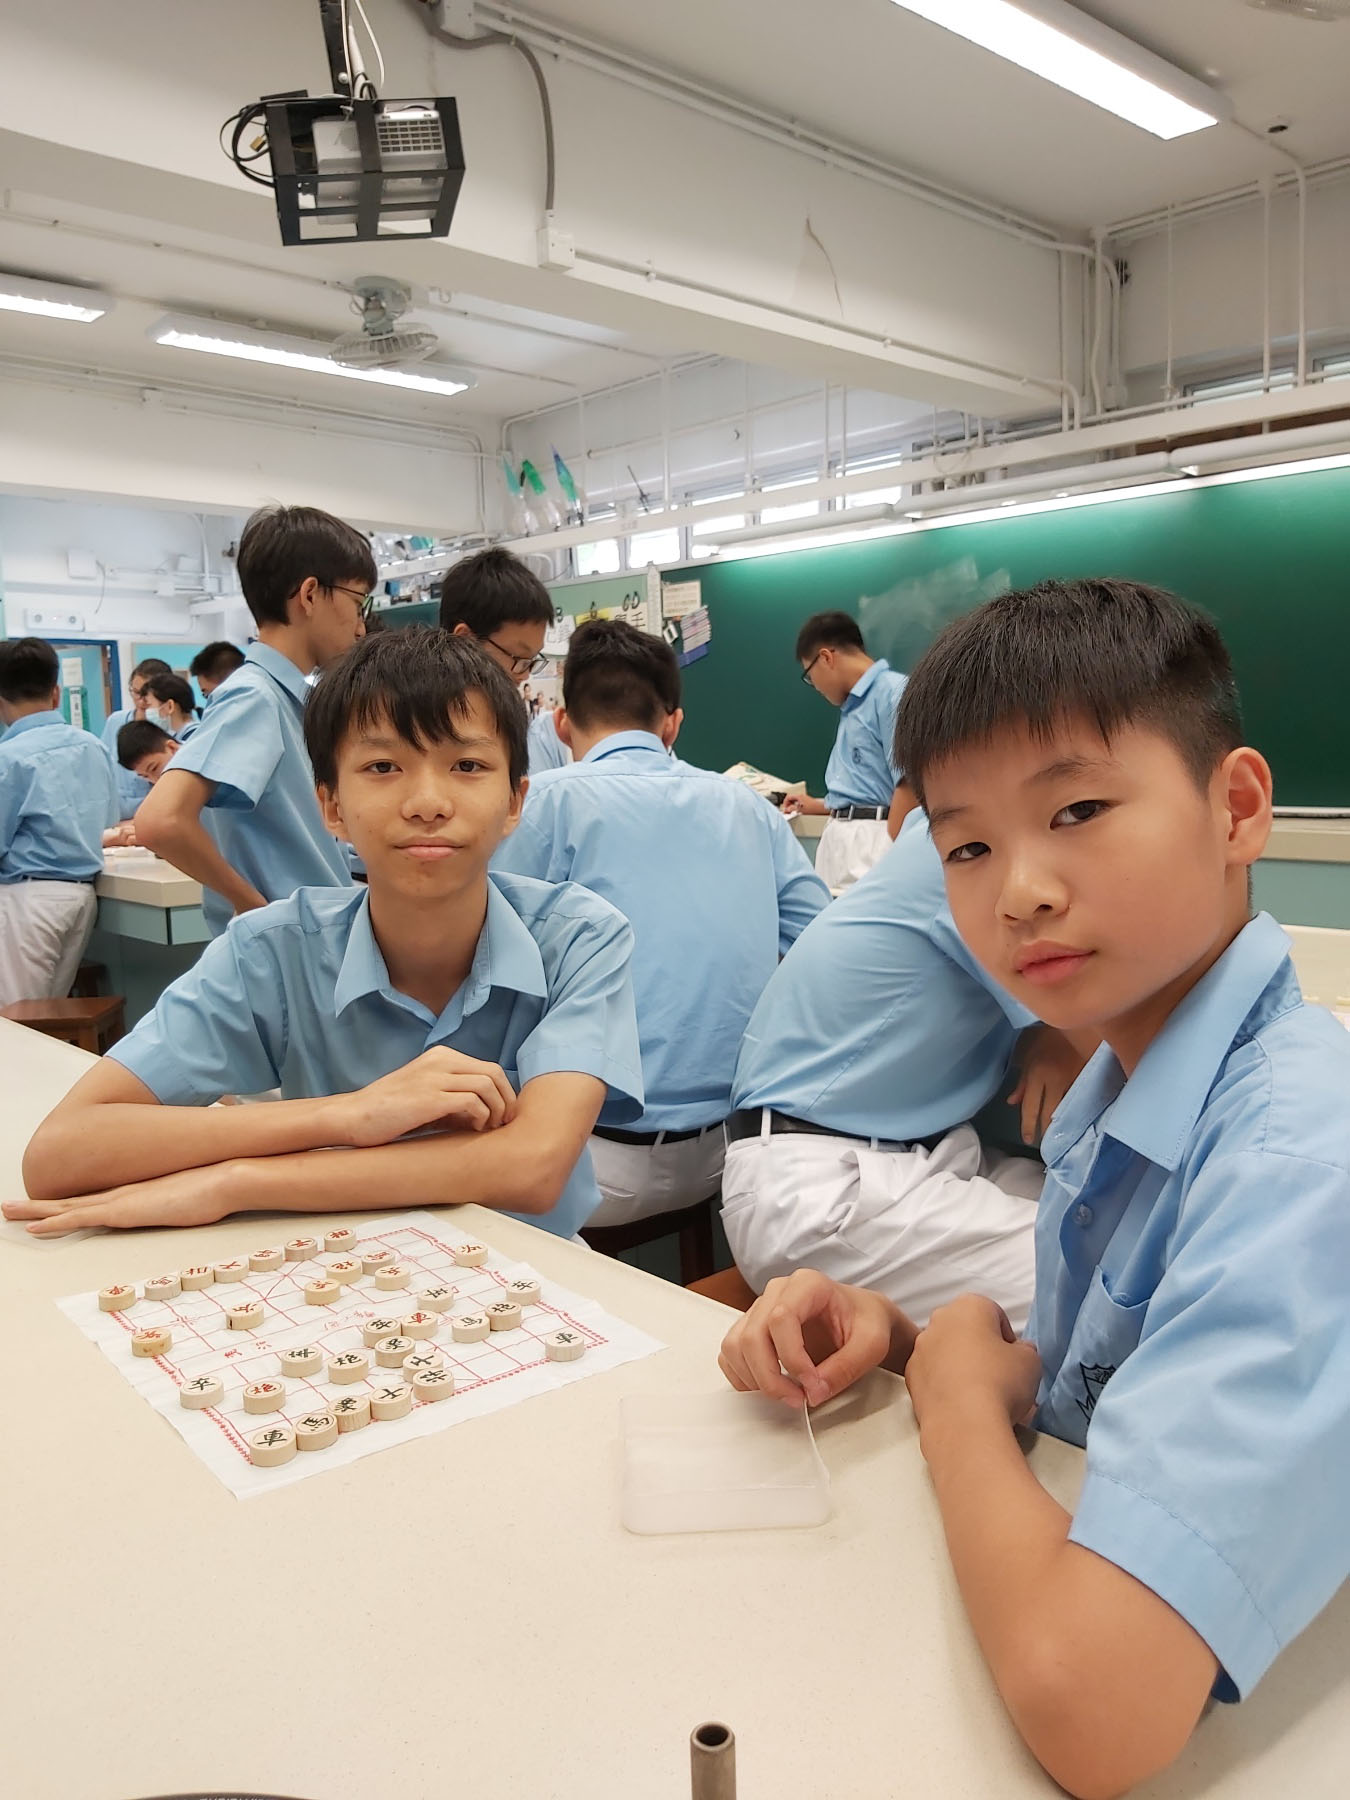 https://www.npc.edu.hk/sites/default/files/20191022_132747.jpg